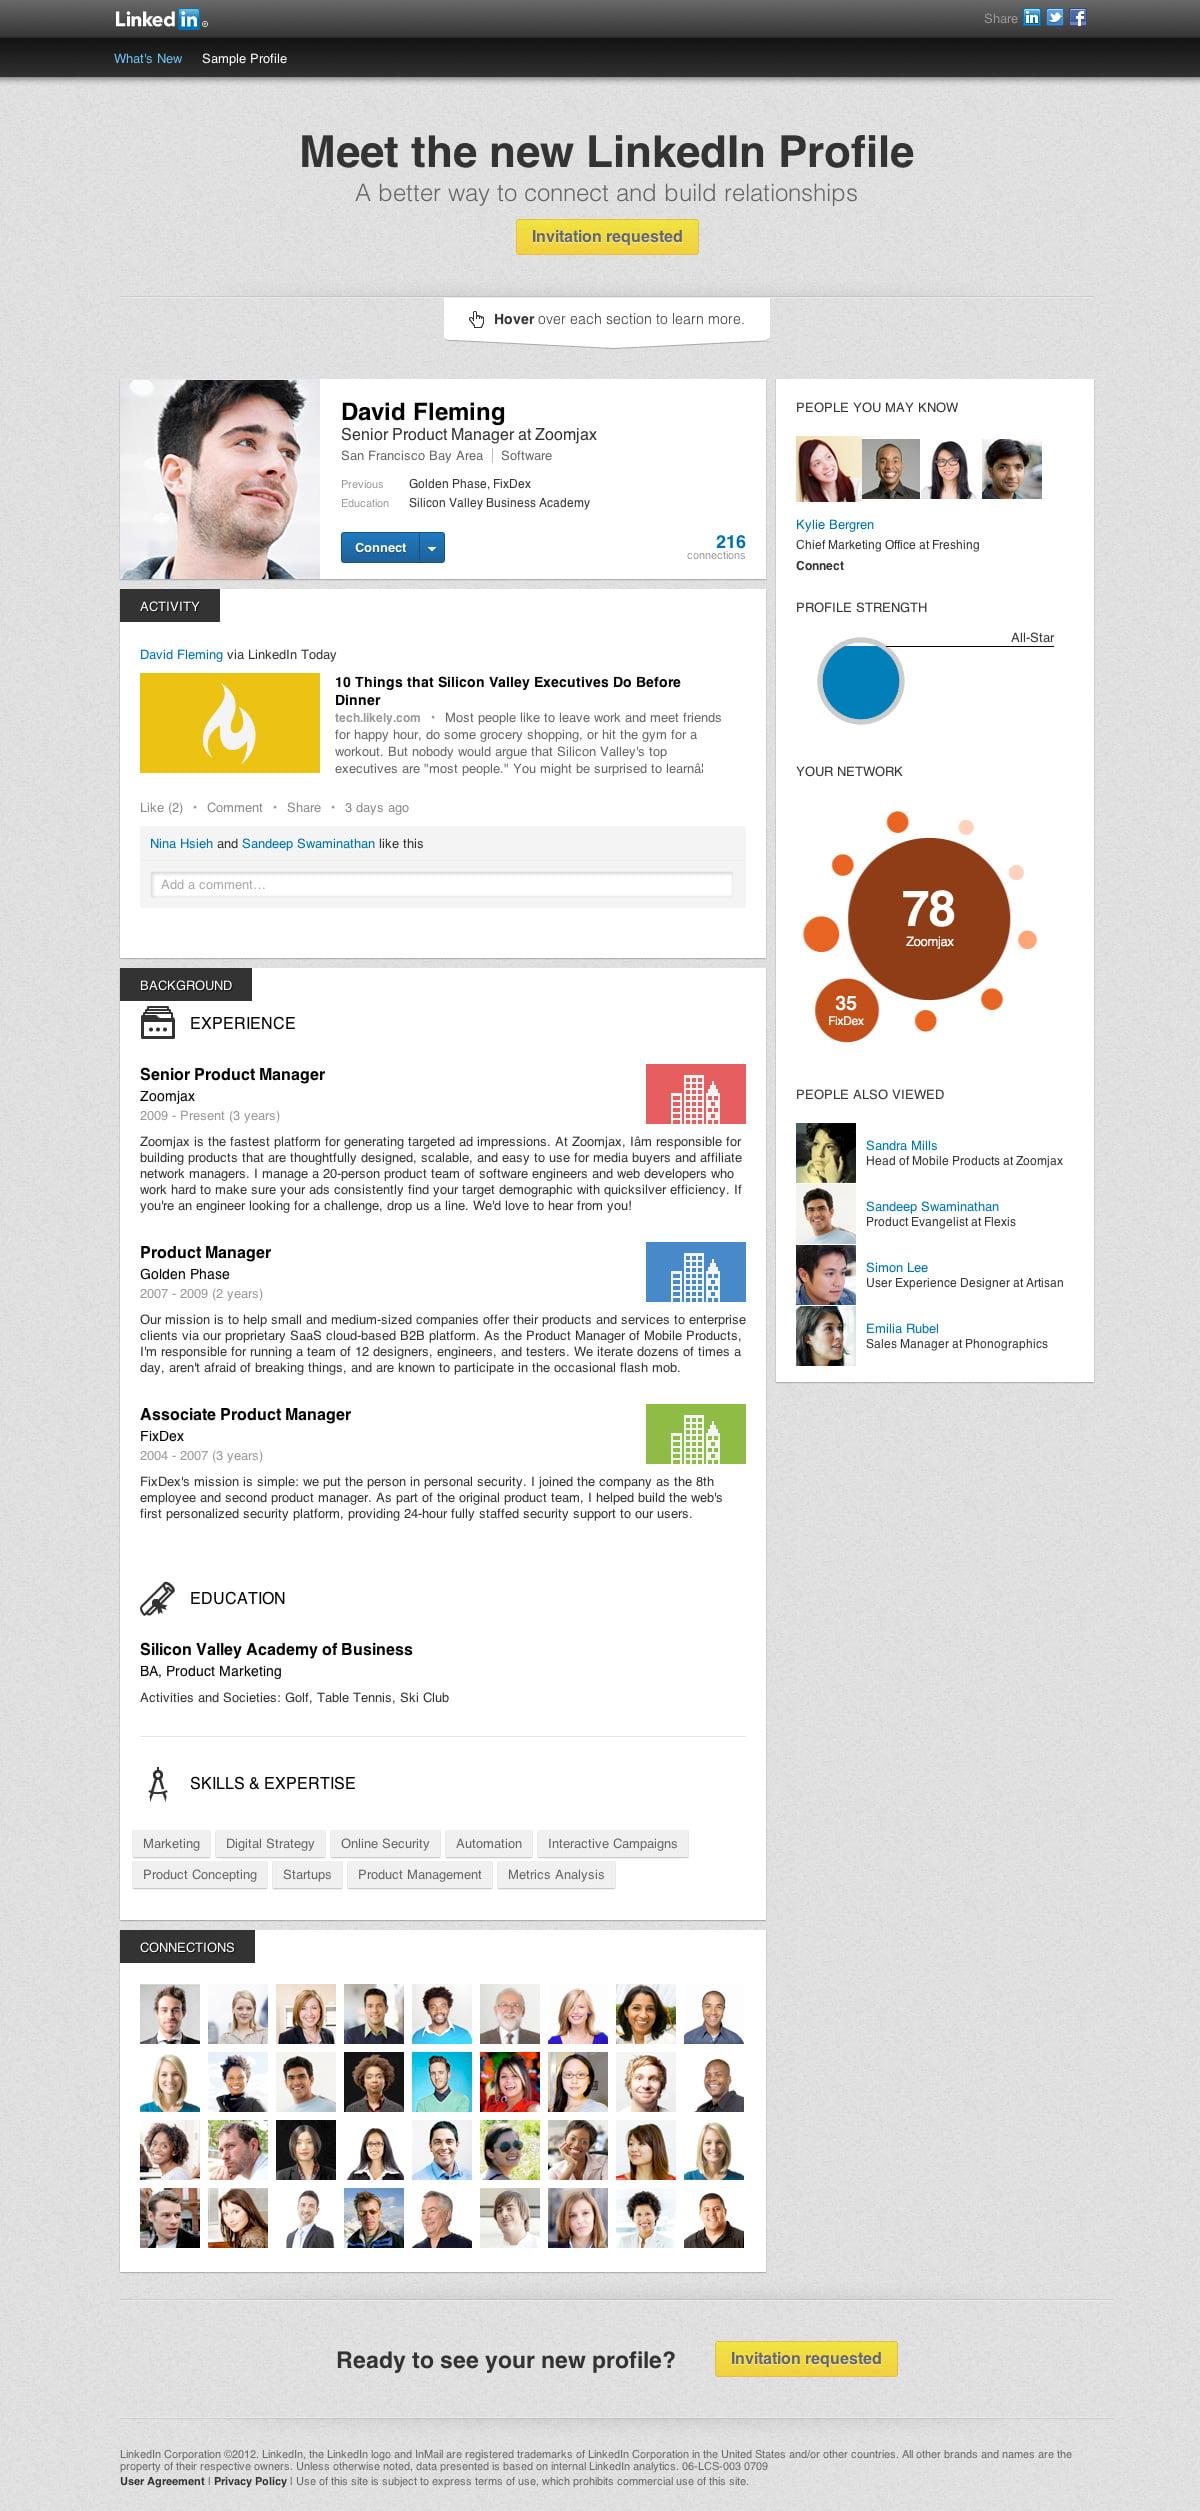 Meet the New LinkedIn Profile